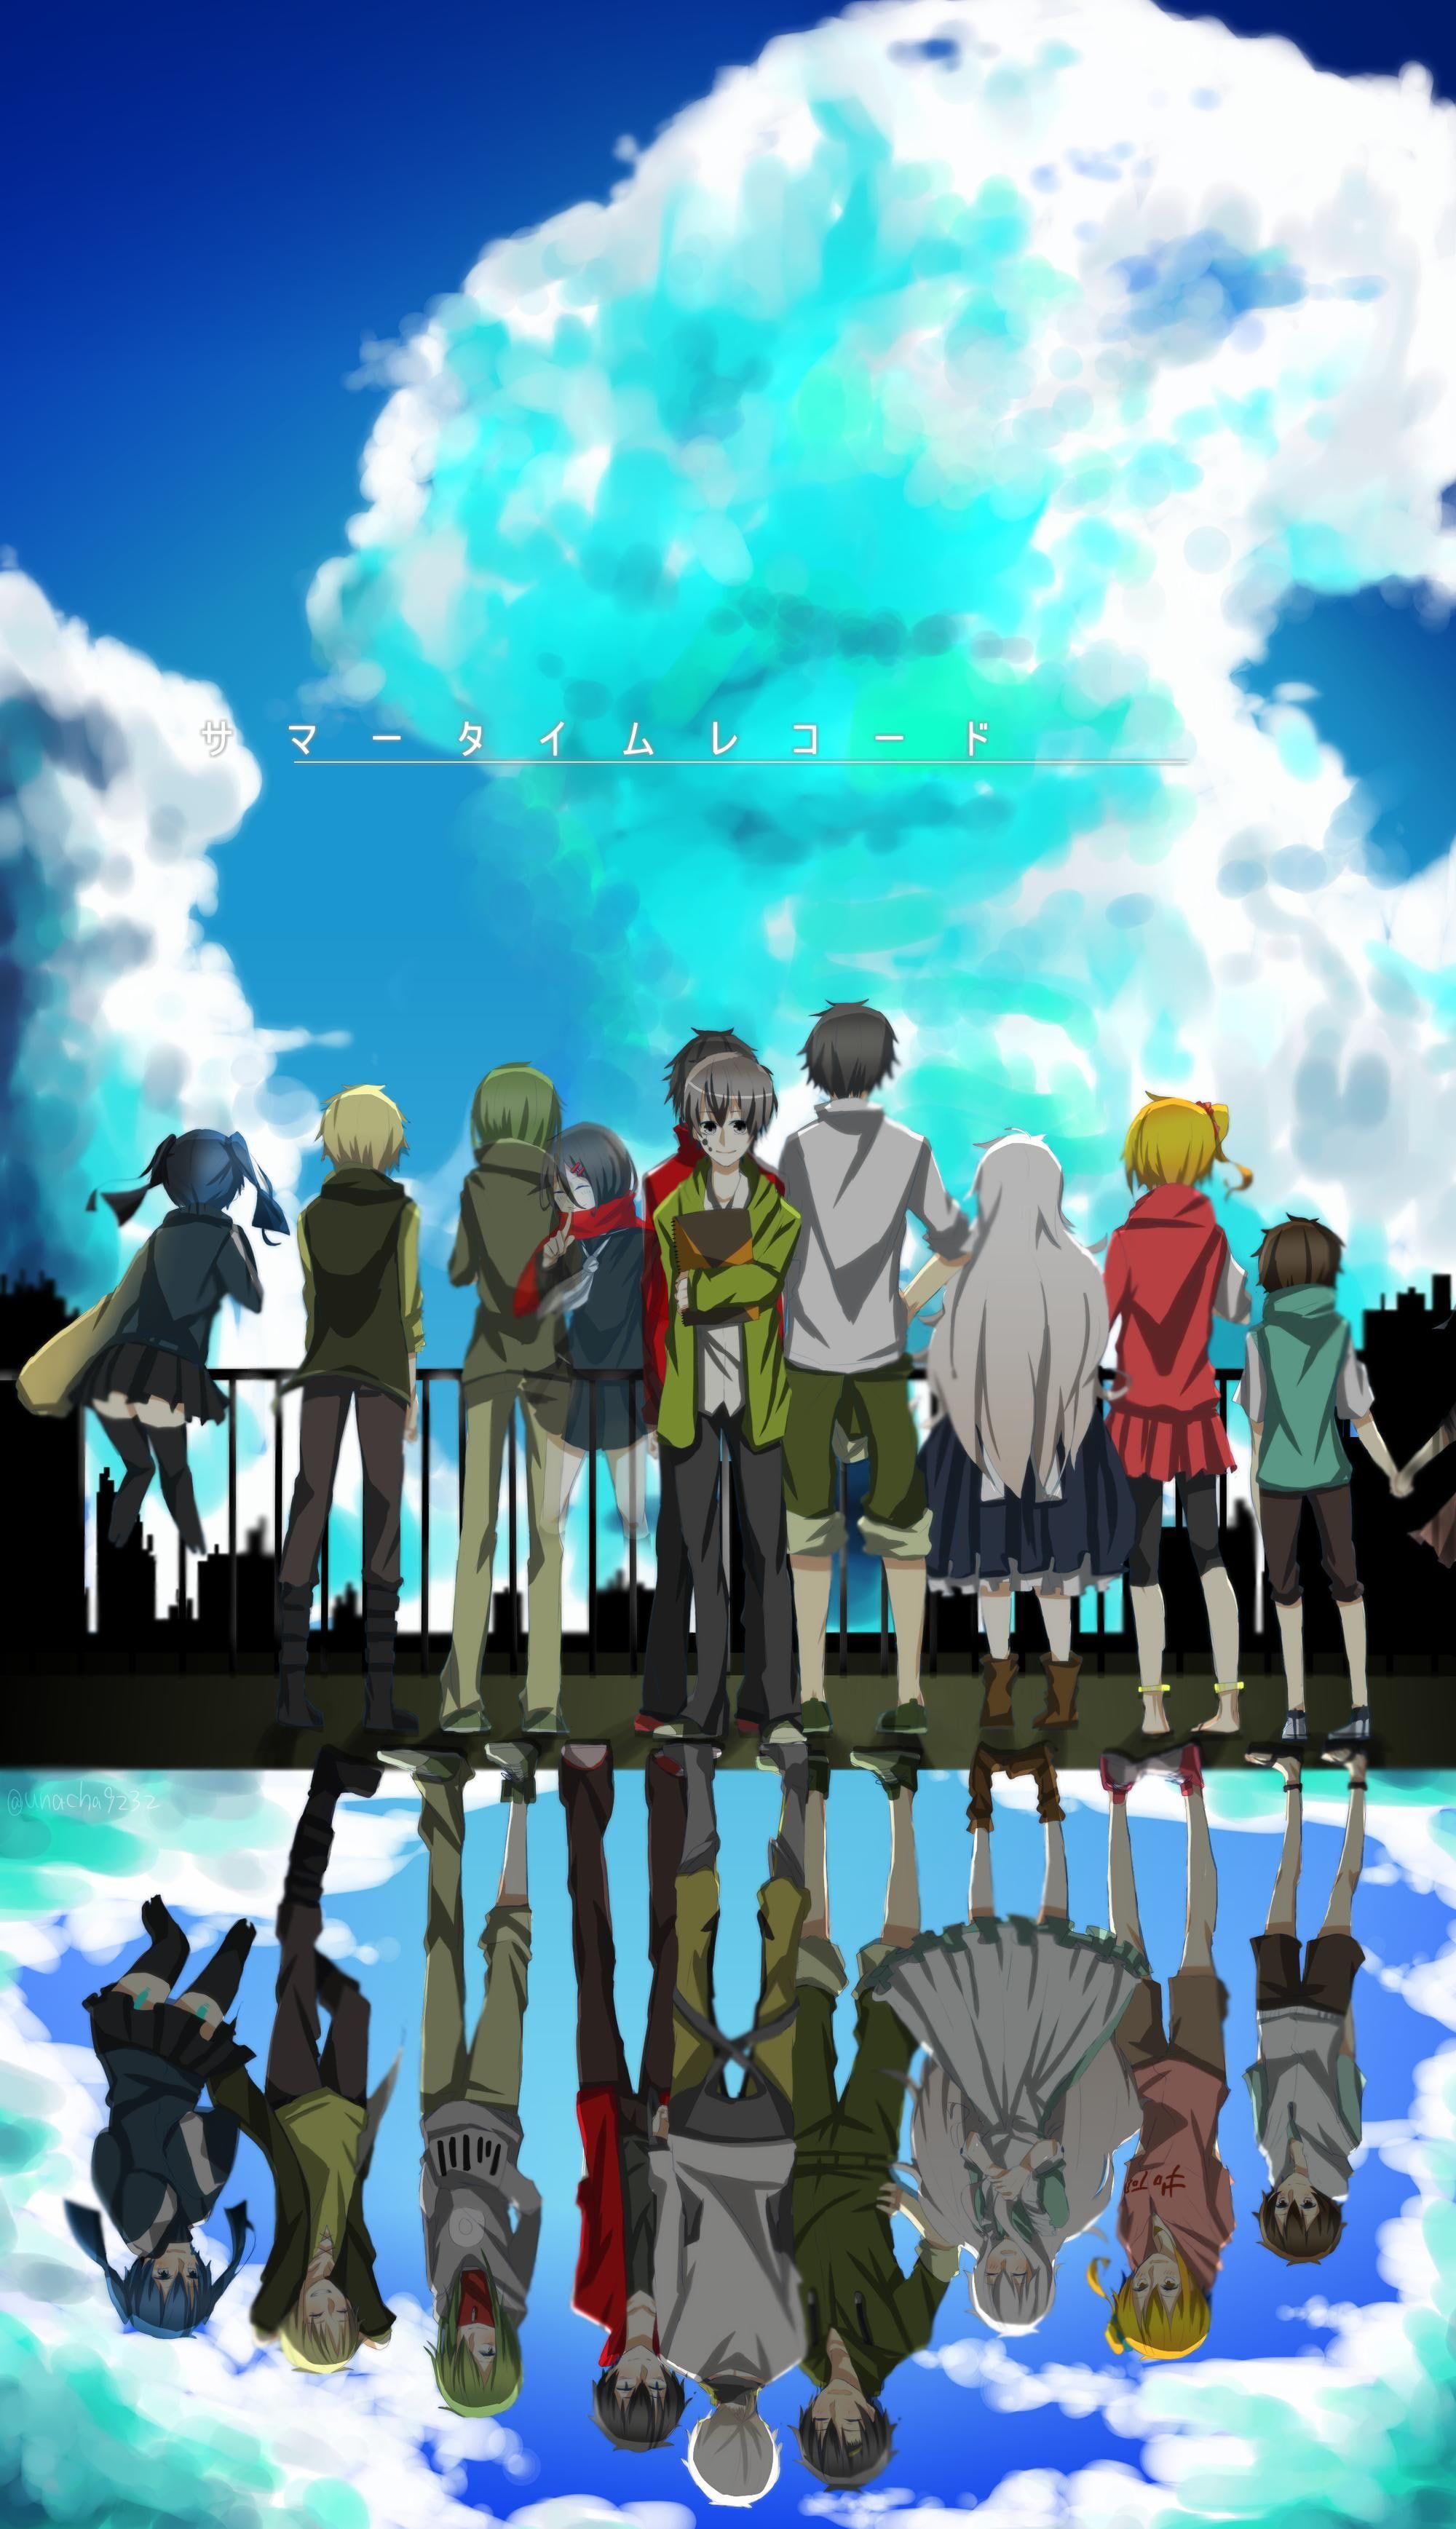 HD wallpaper: Kagerou Project, Anime, Girl